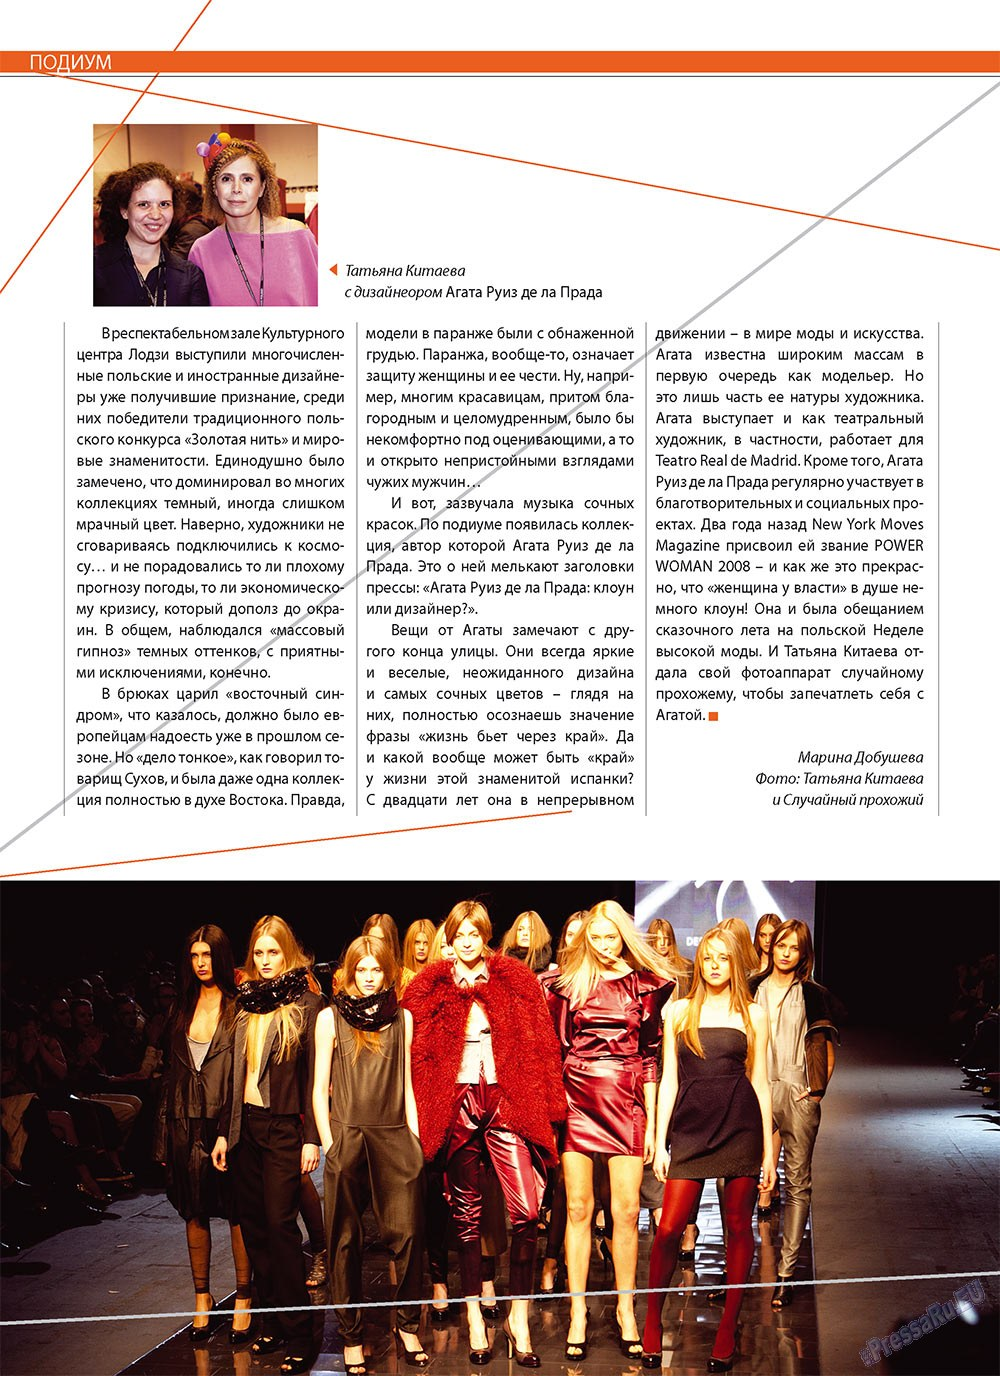 Артек (журнал). 2010 год, номер 3, стр. 24